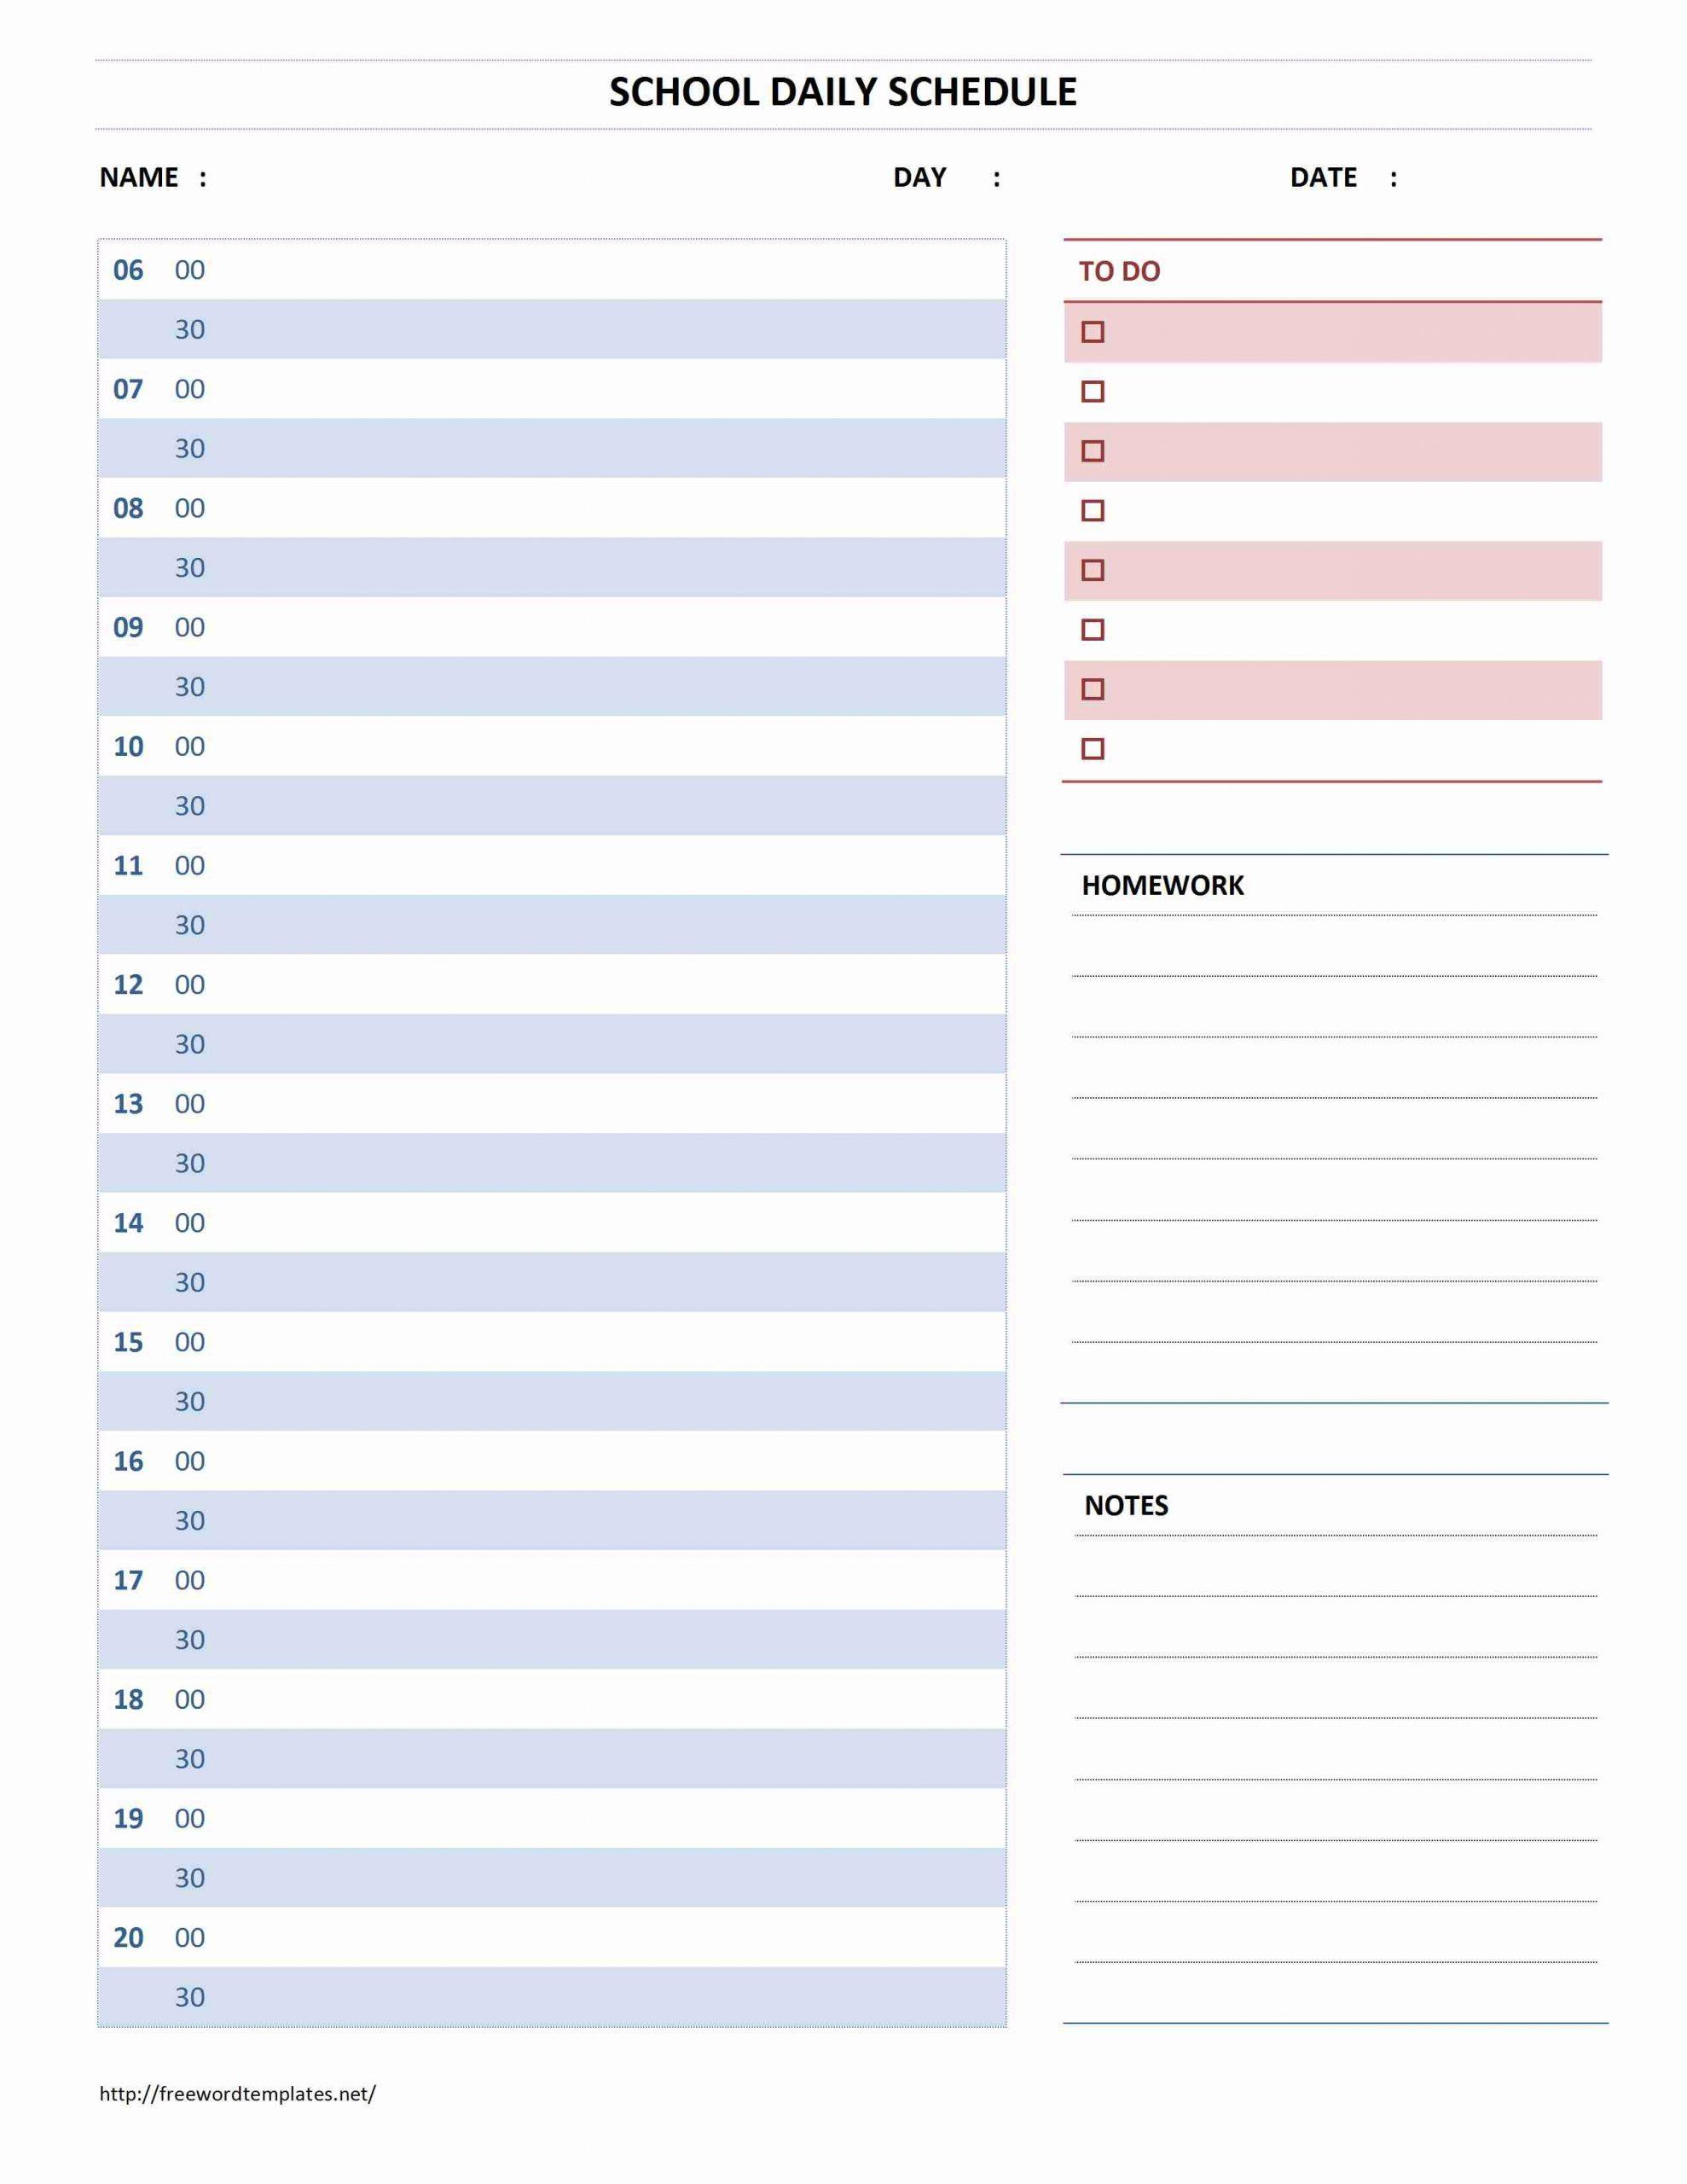 Daily Calendar Template Microsoft Word   Daily Calendar One Day Hourly Calendar Free Printable